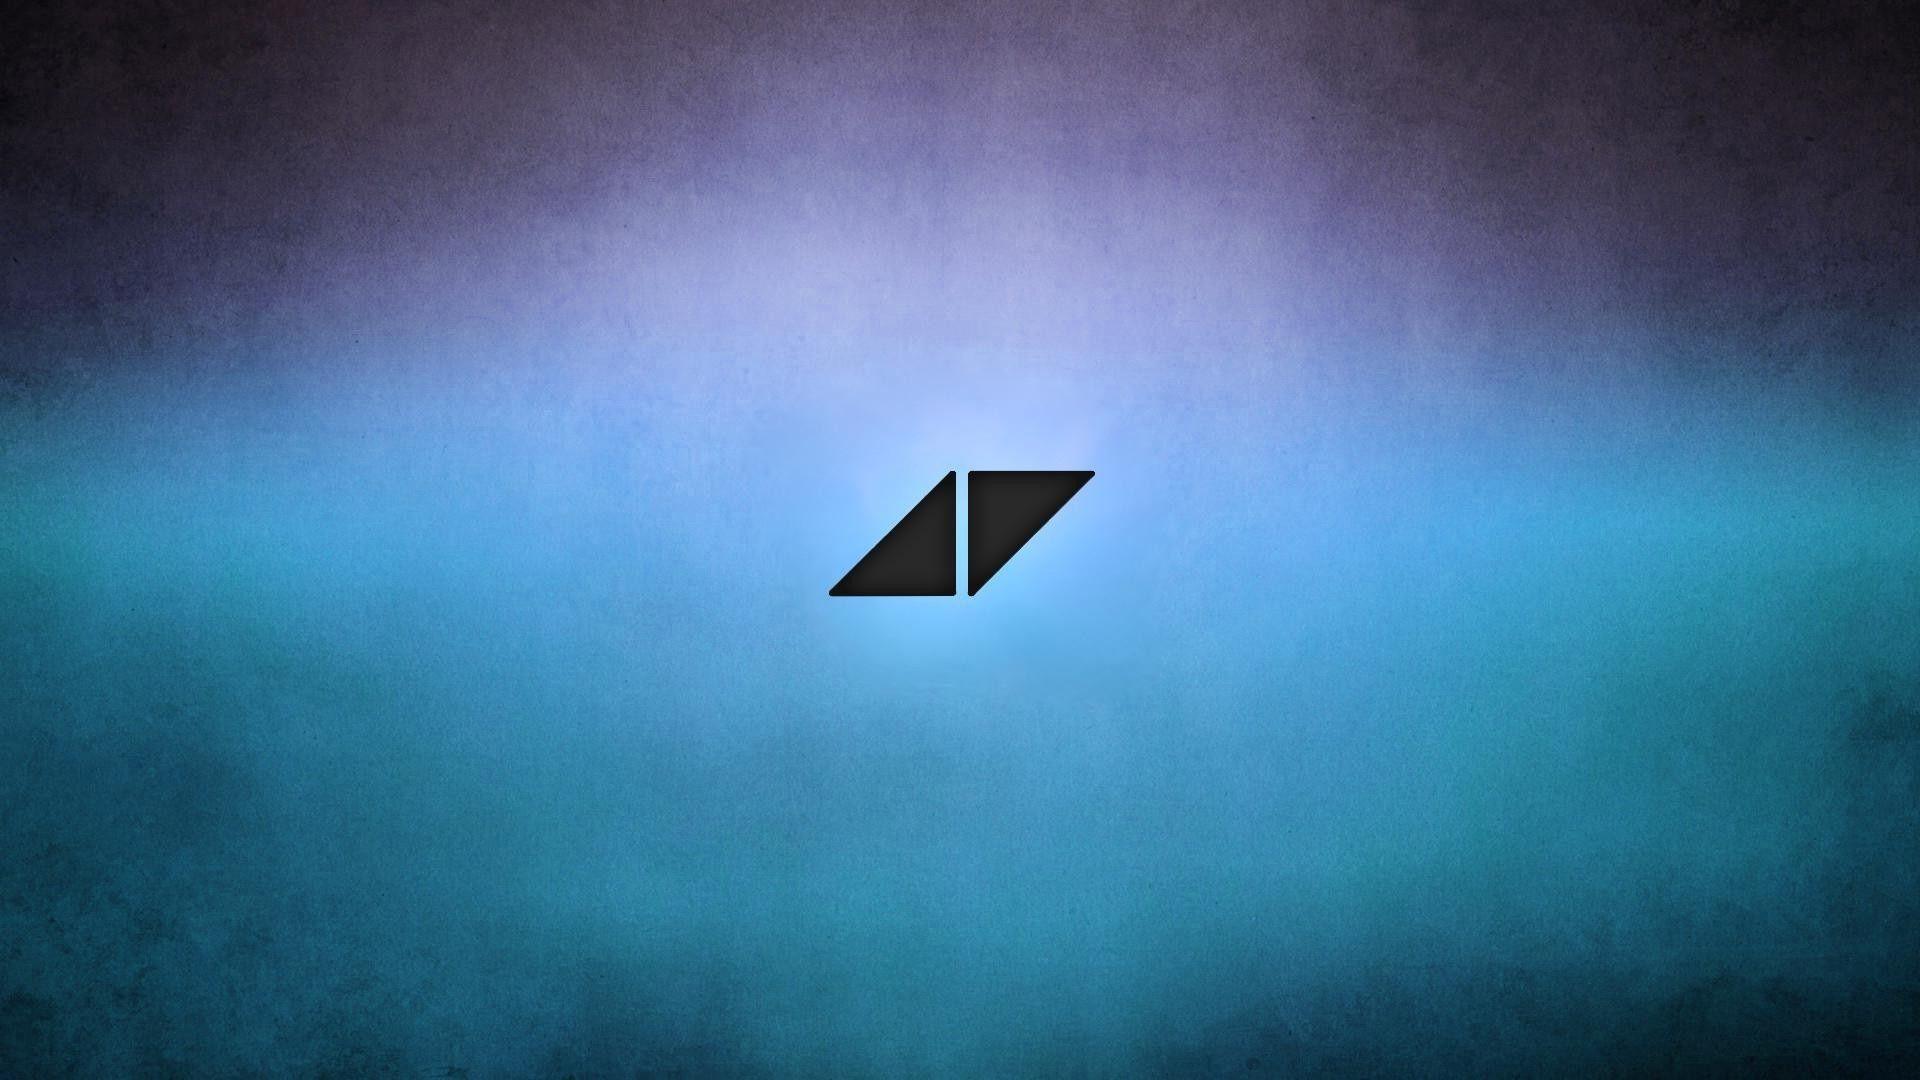 10 Avicii HD Wallpapers